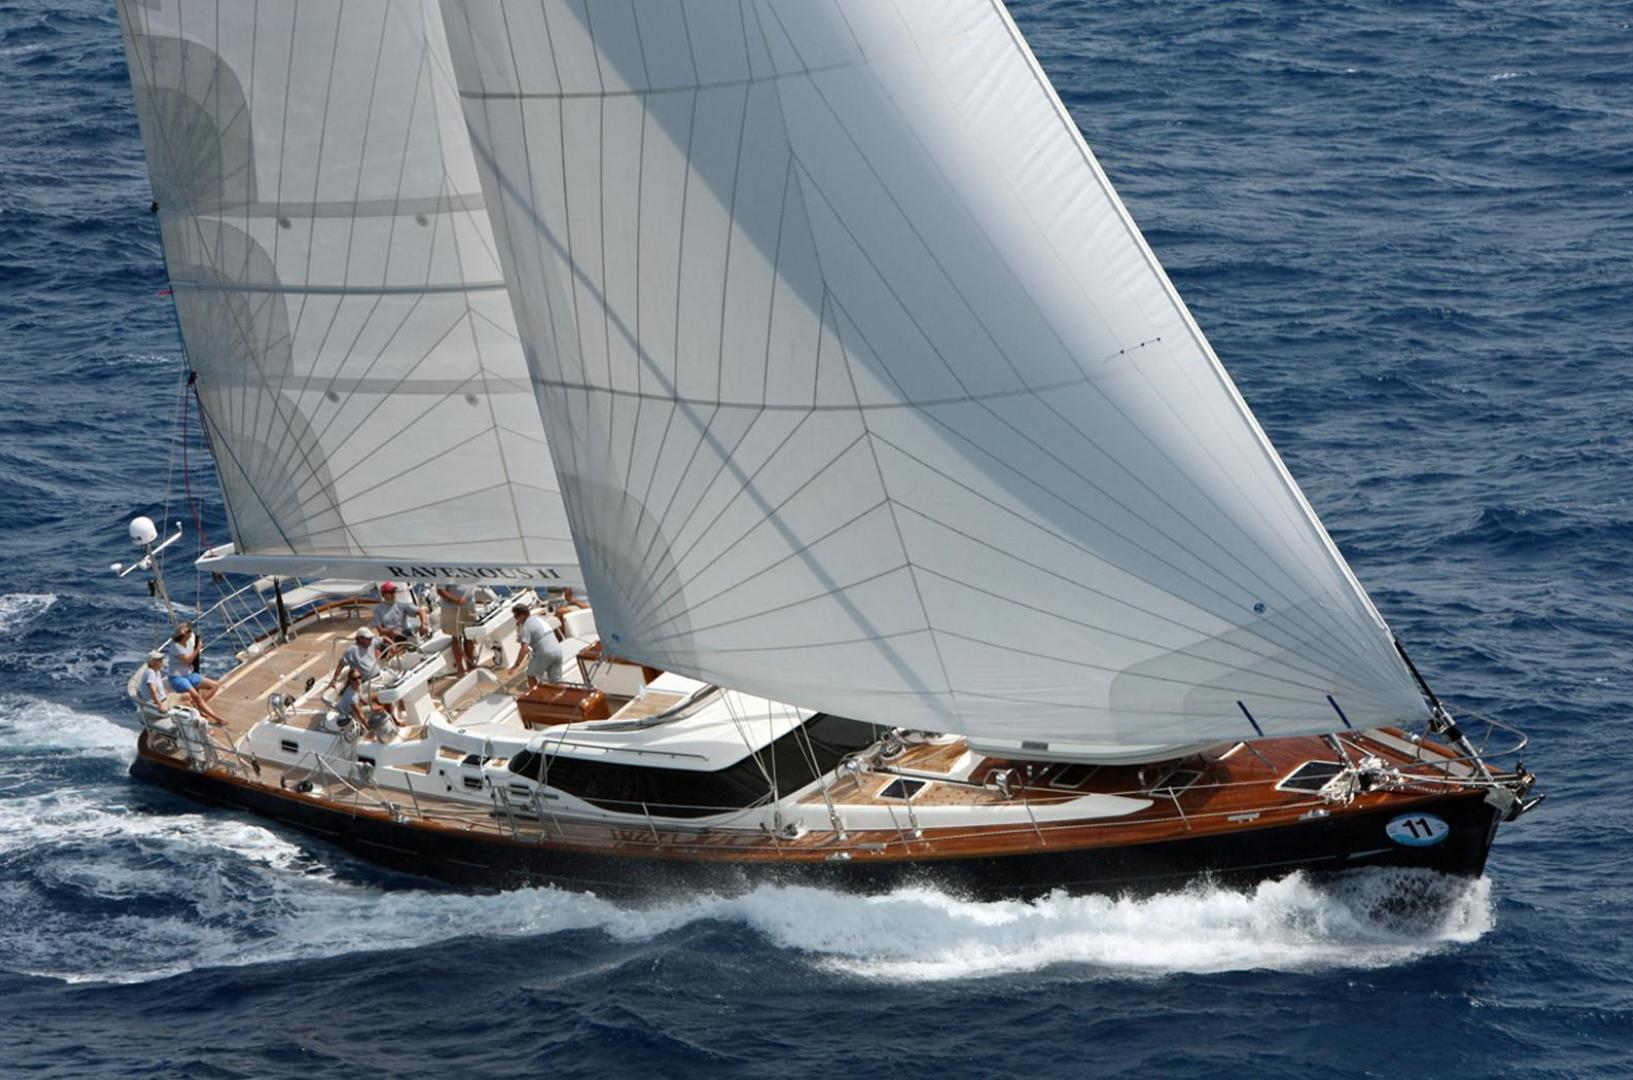 Sailing yacht RAVEN - cruising under full sail